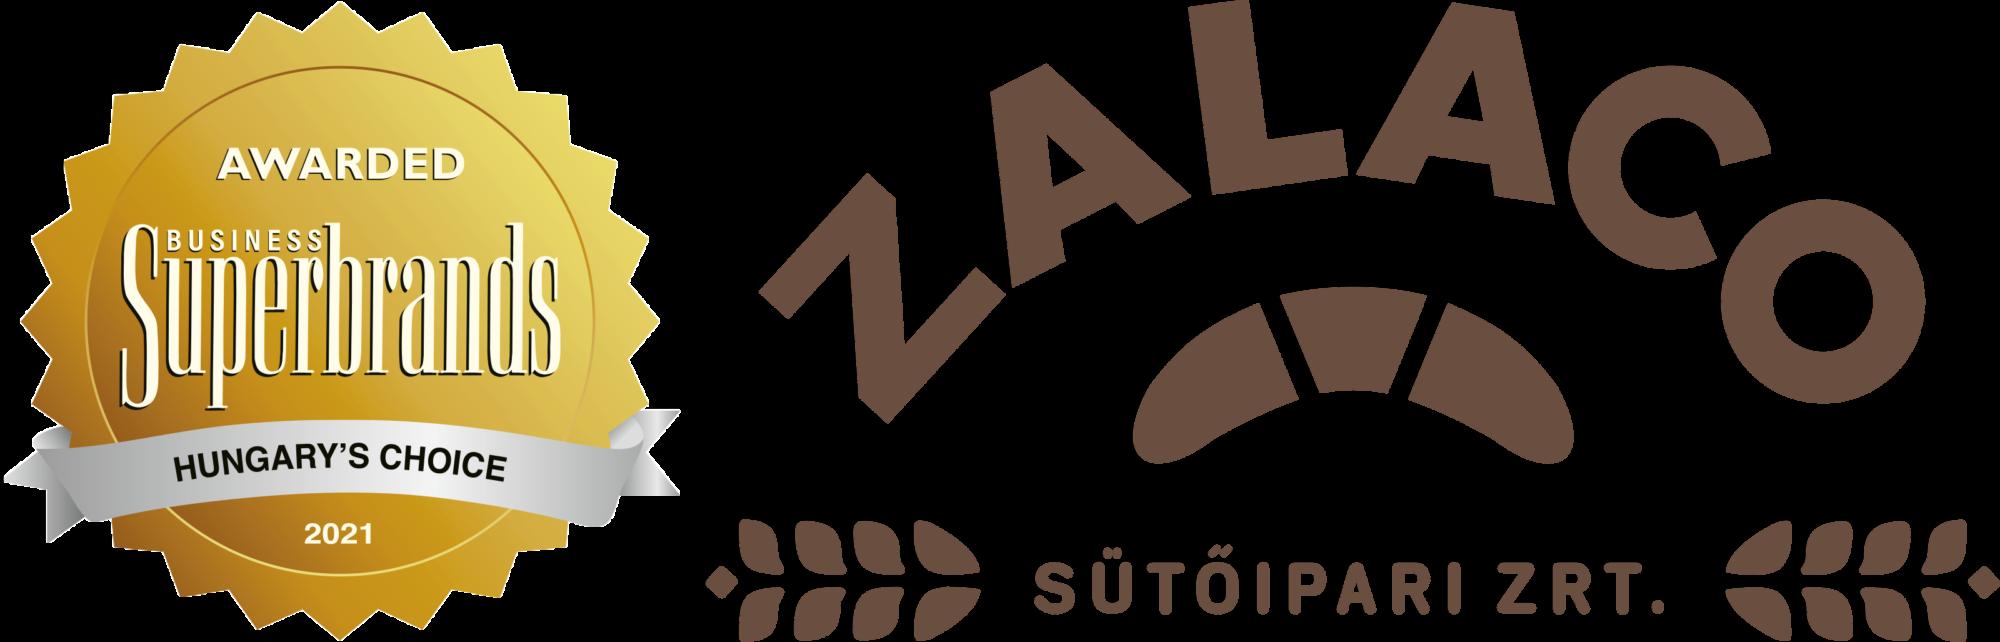 Zalaco Sütőipari Zrt